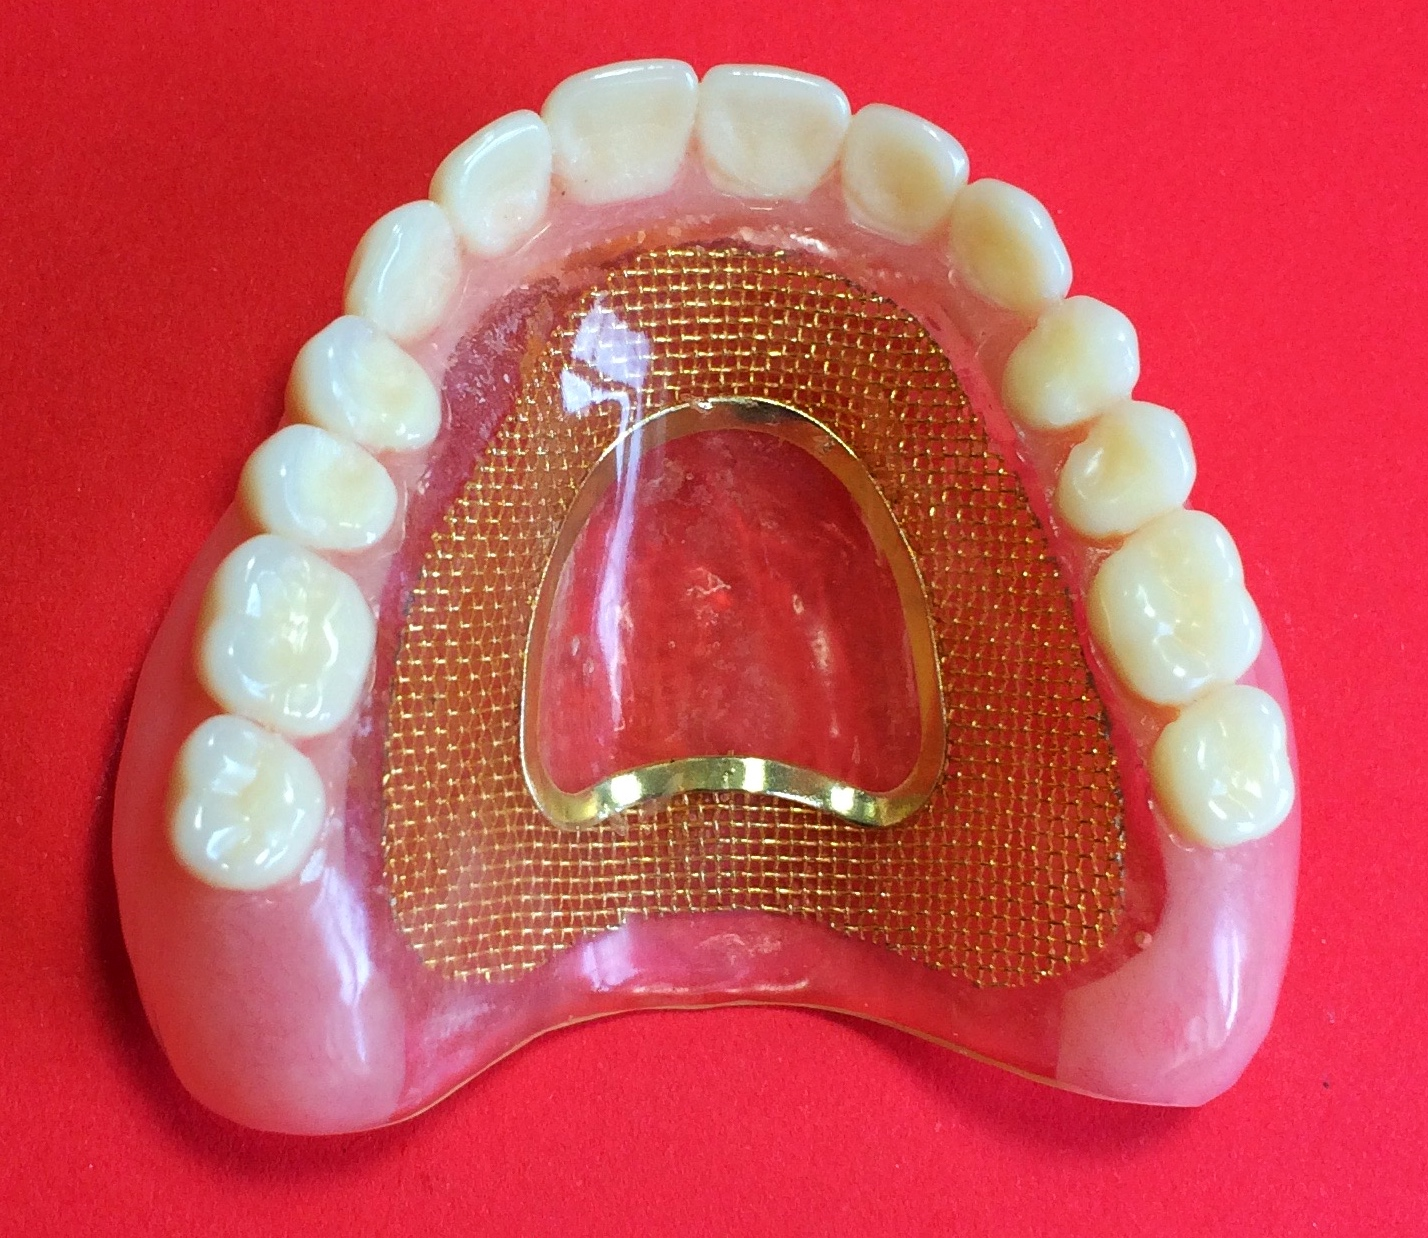 Ariana Dental Lab Denture Specialist Ariana Dental Lab Inc